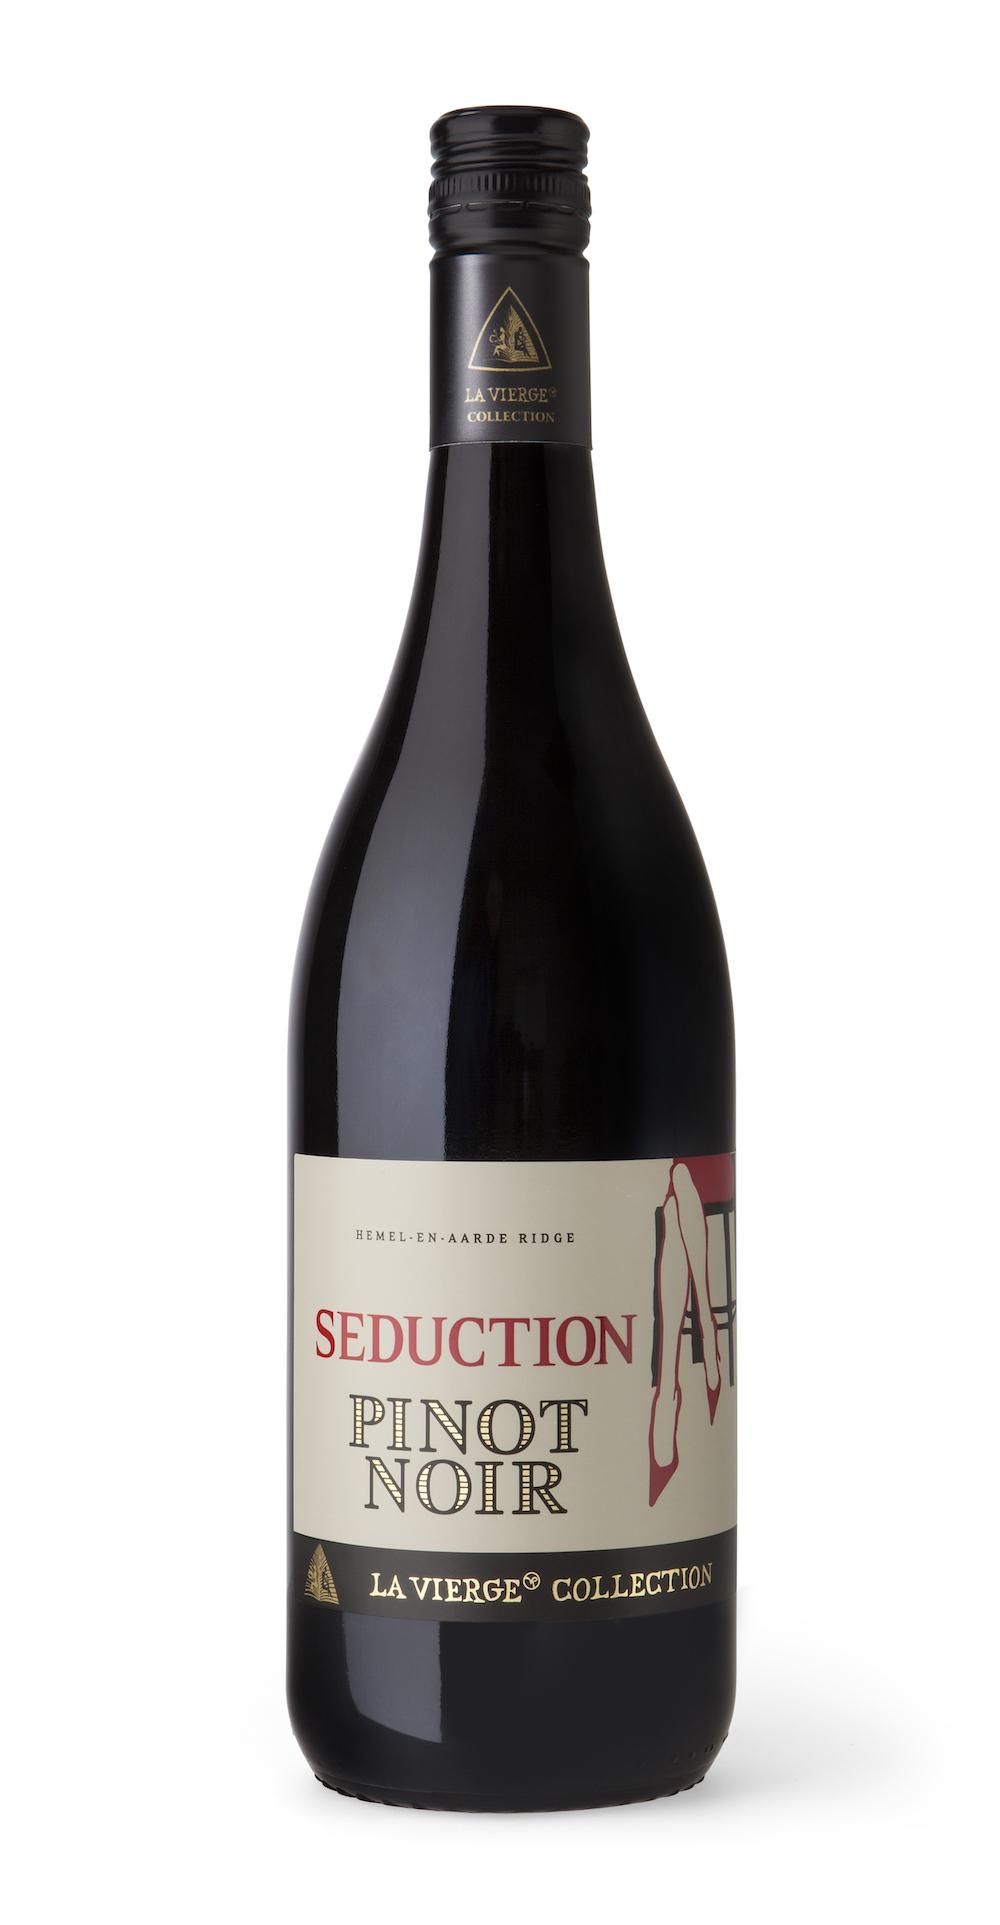 Seduction Pinot Noir Resize.jpg